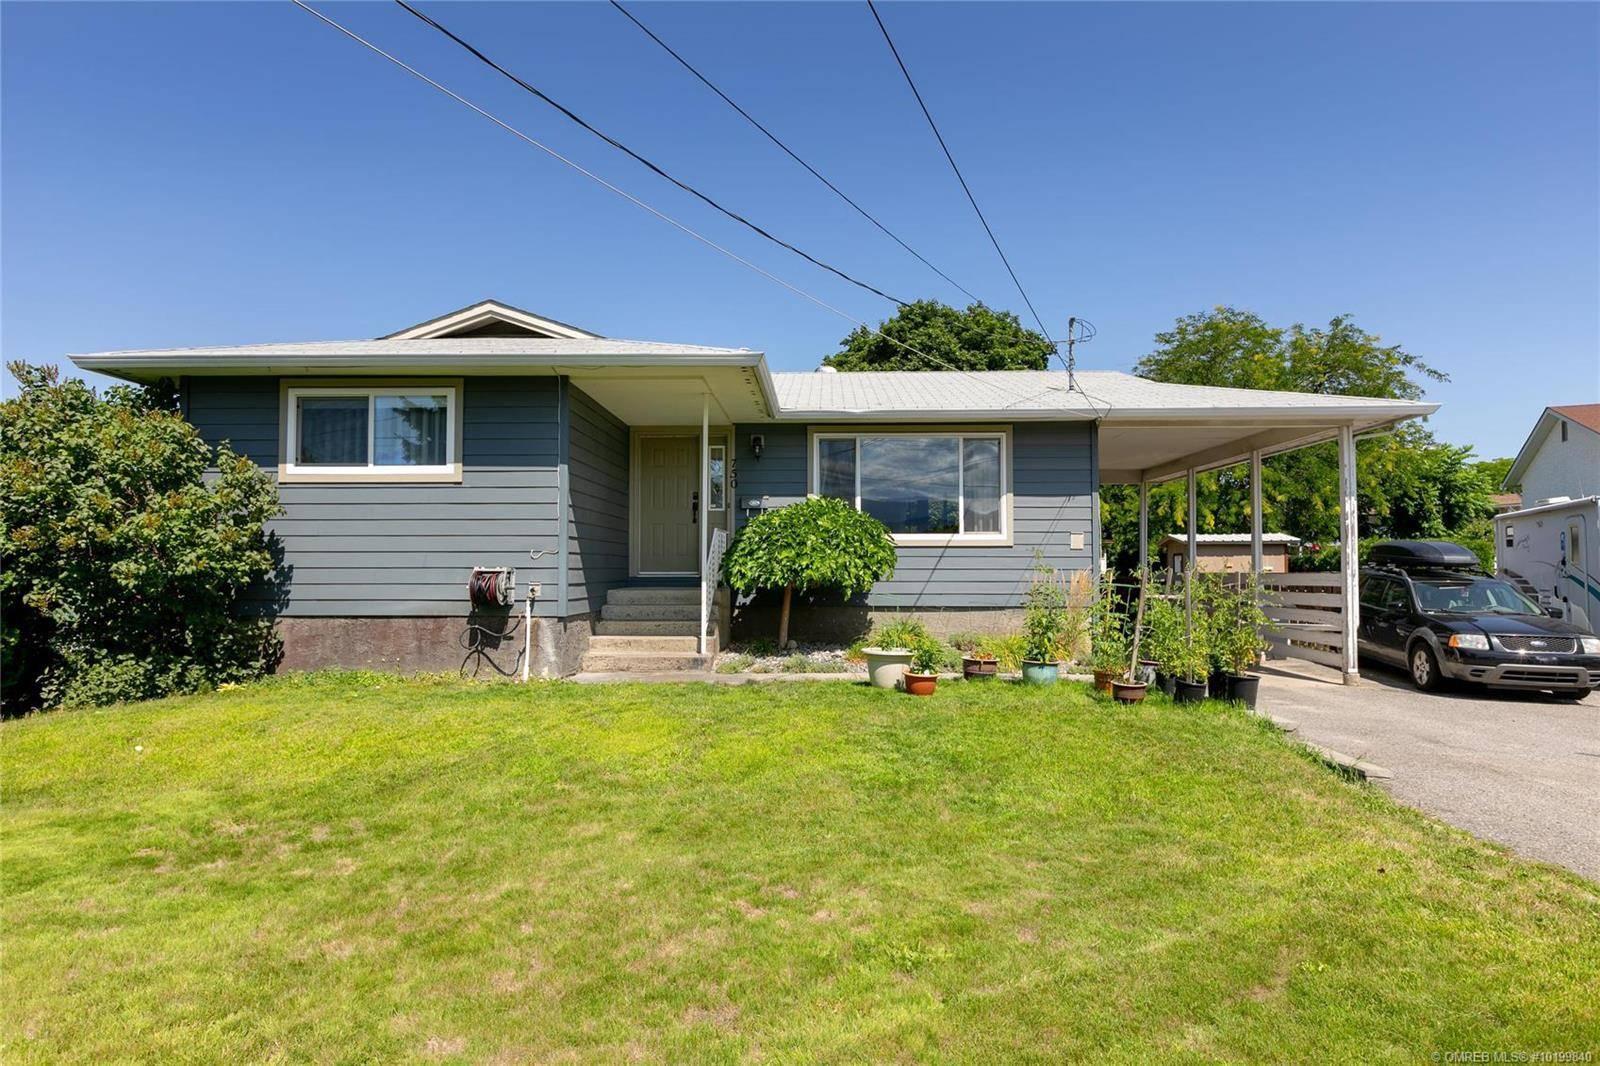 House for sale at 750 Graham Rd Kelowna British Columbia - MLS: 10199840